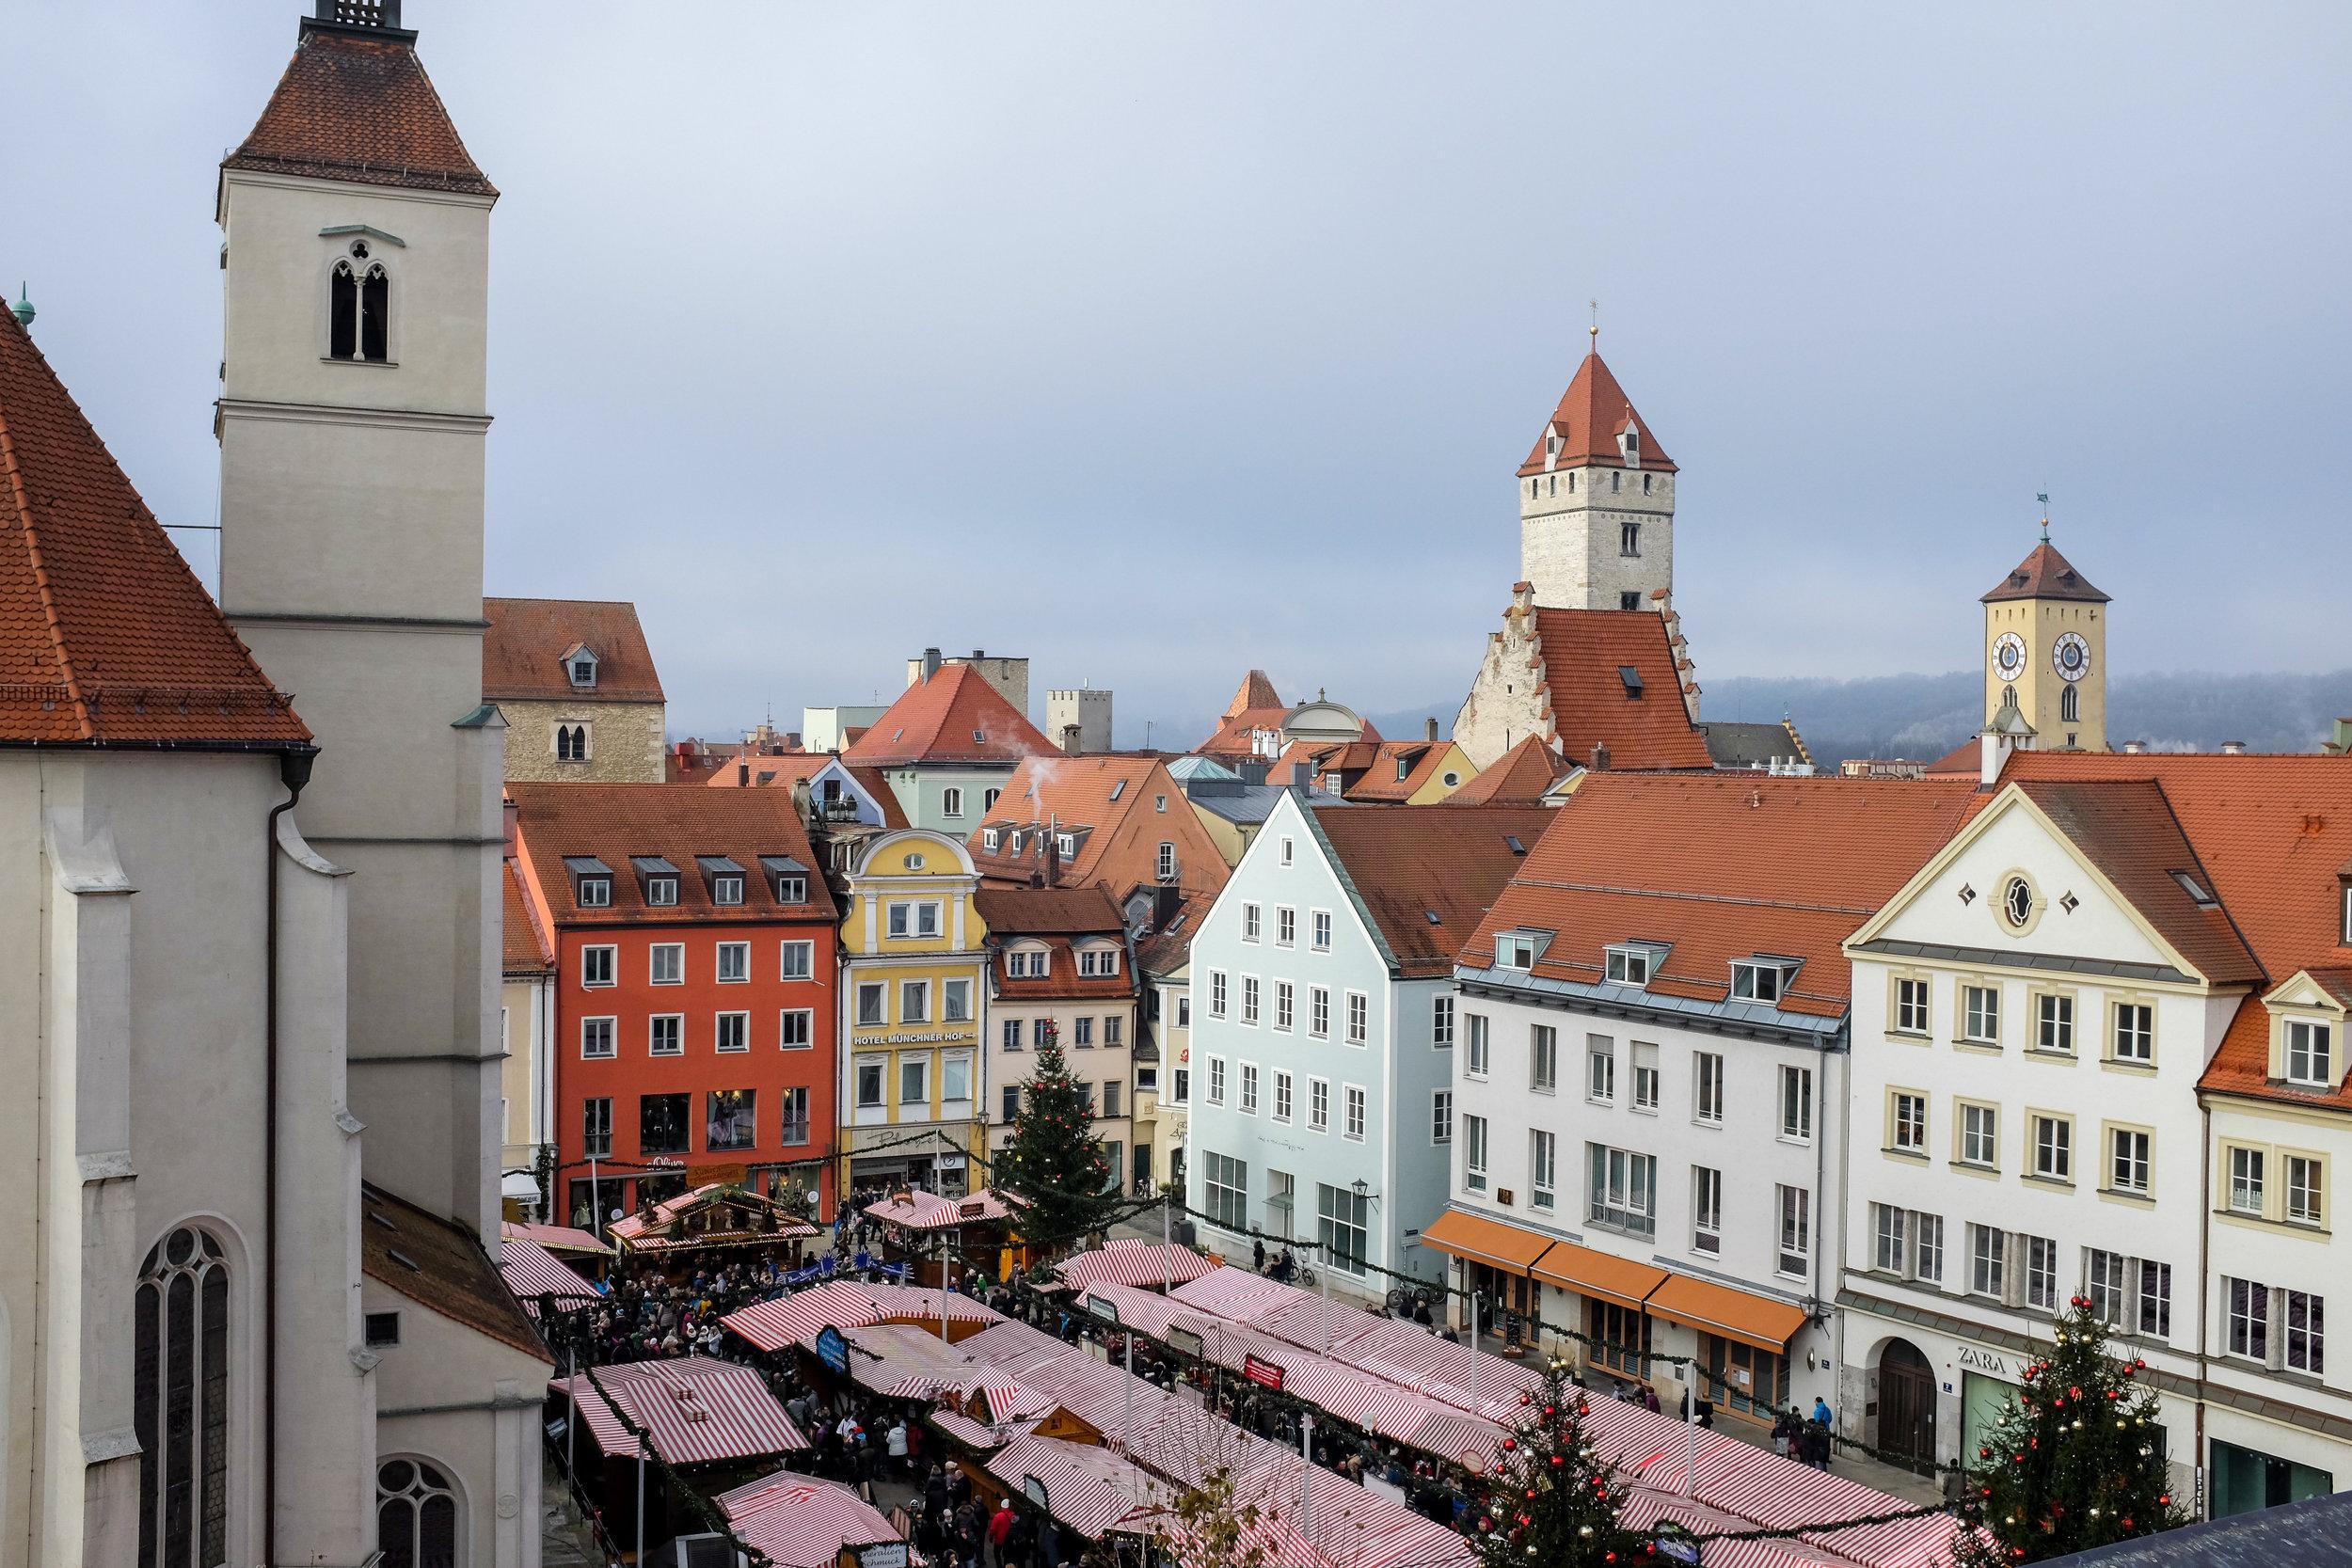 Regensburg / Germany